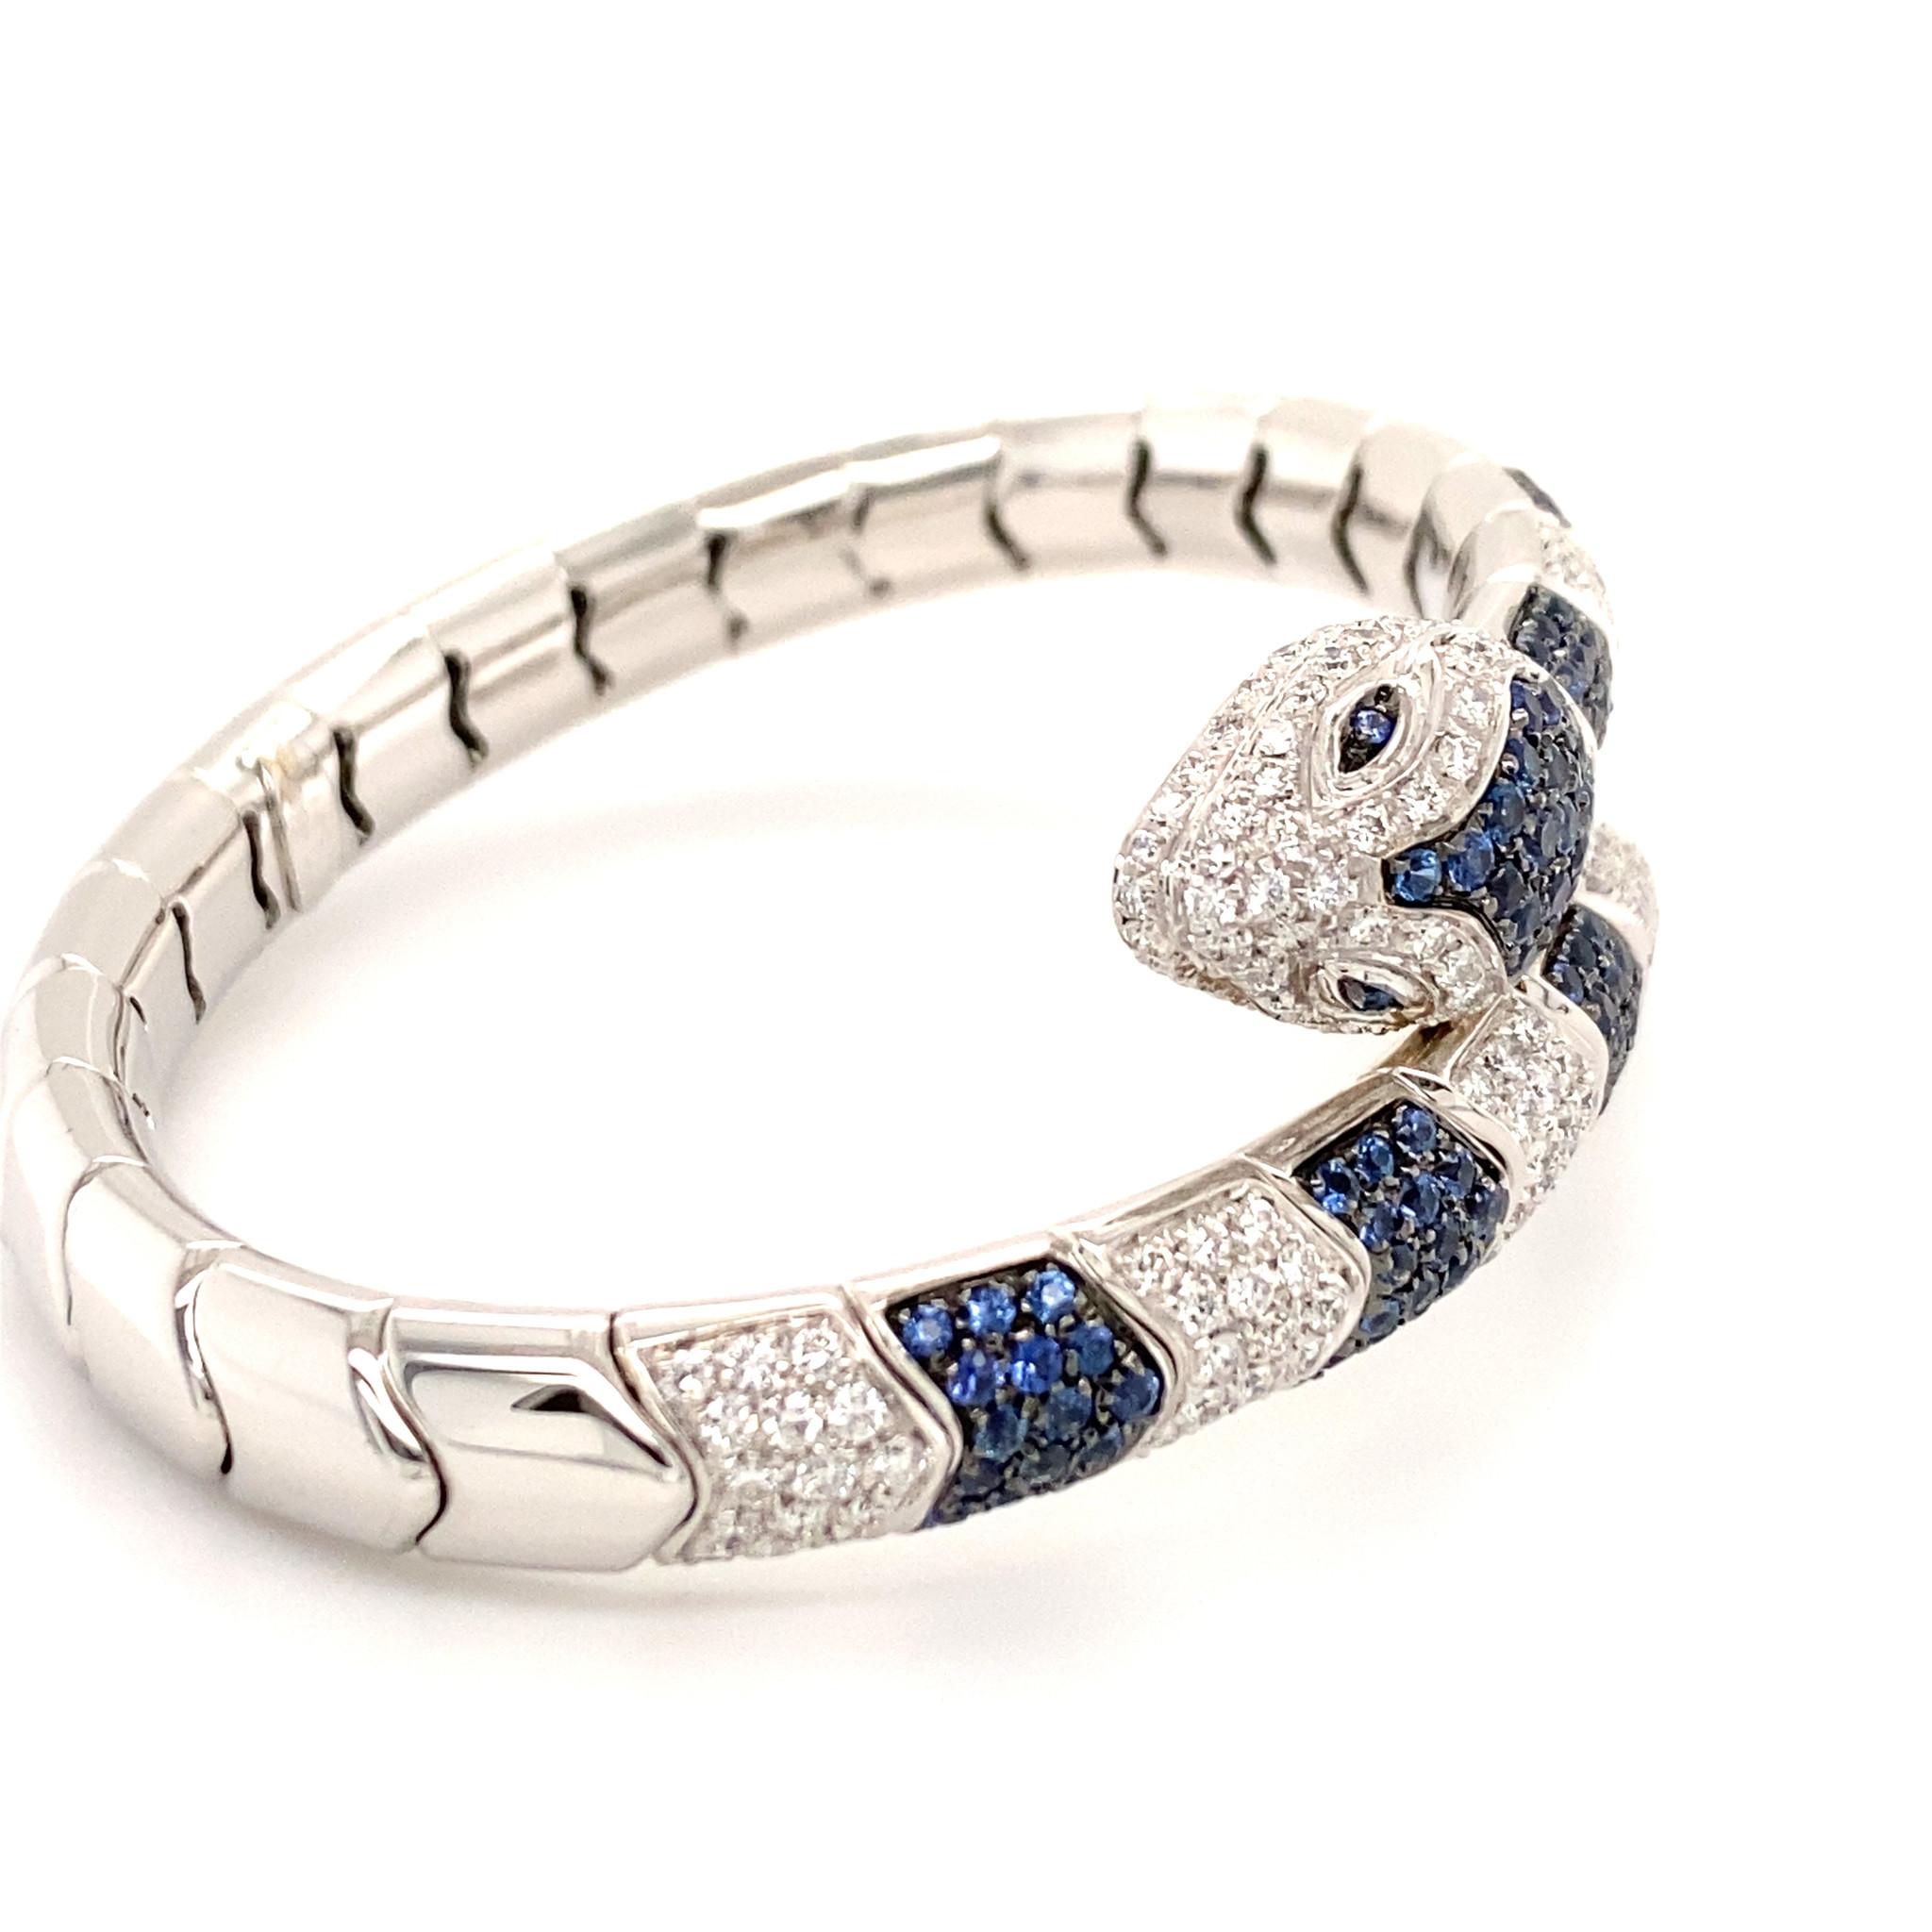 Leo Pizzo Leo Pizzo Animalia 18 krt. witgouden slangarmband pavé gezet met blauwe saffier en witte diamant